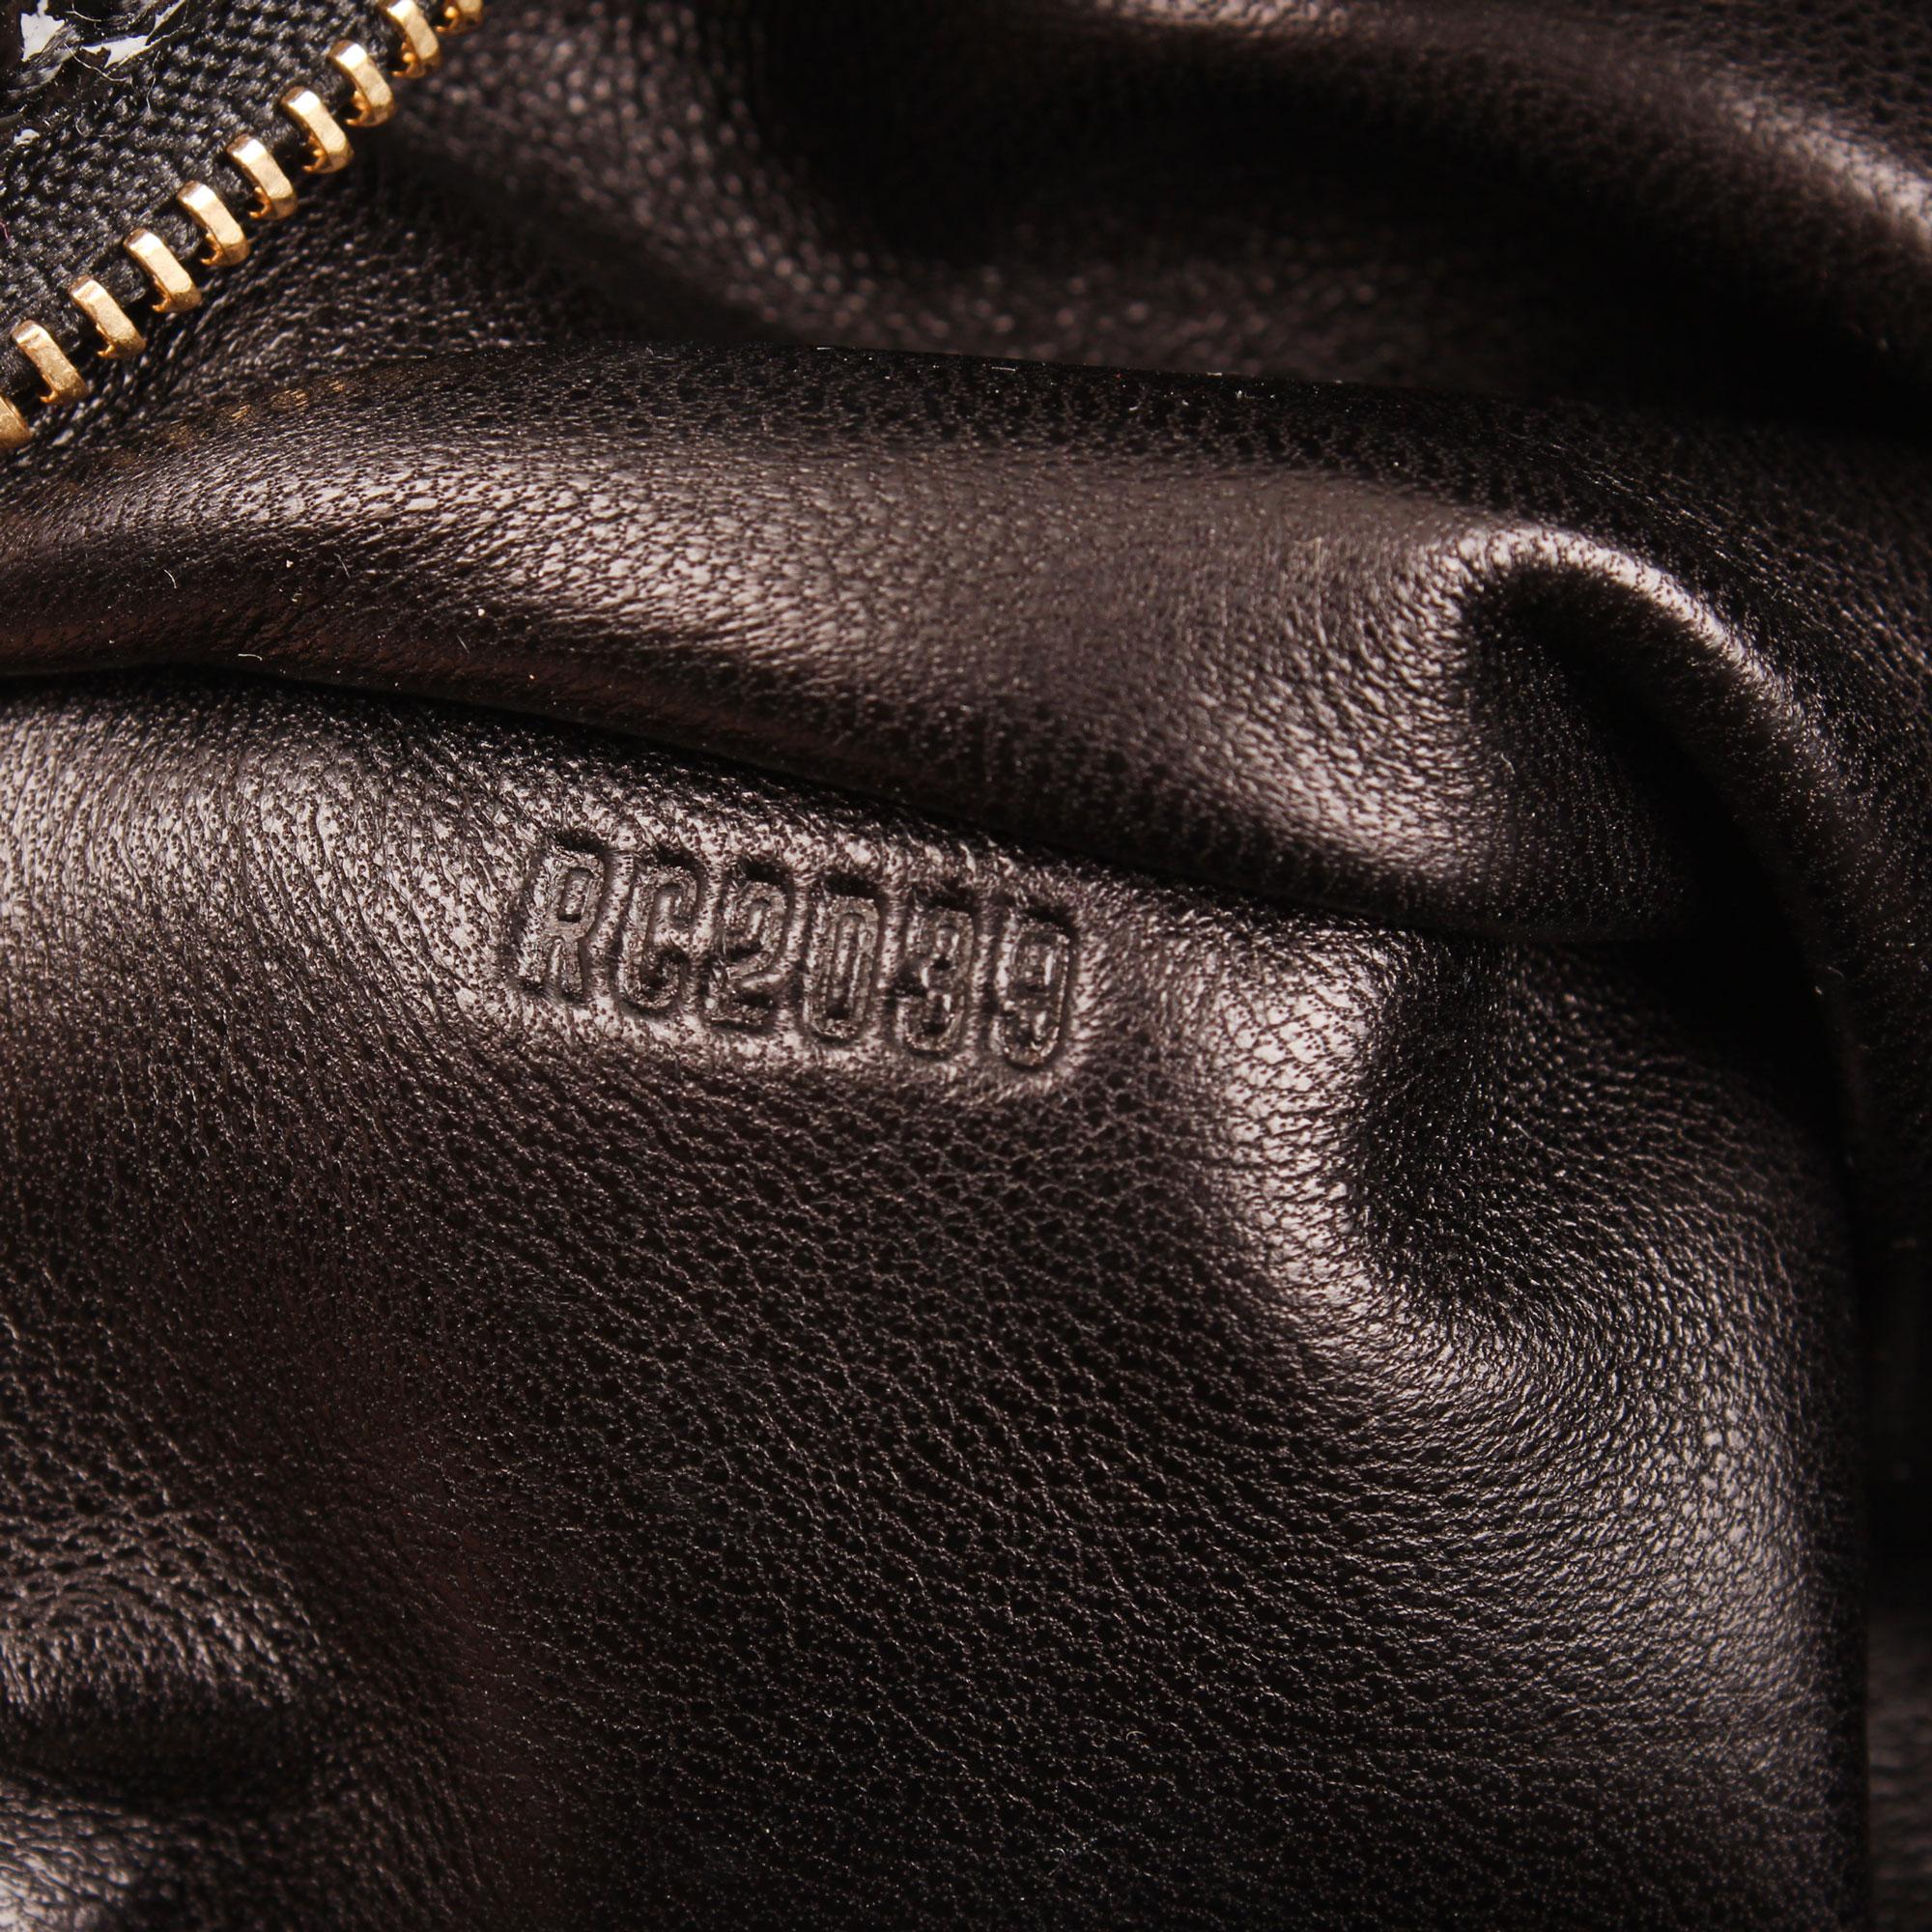 Imagen del numero de serie del louis vuitton coquette clutch embossed monogram azul marino tela piel